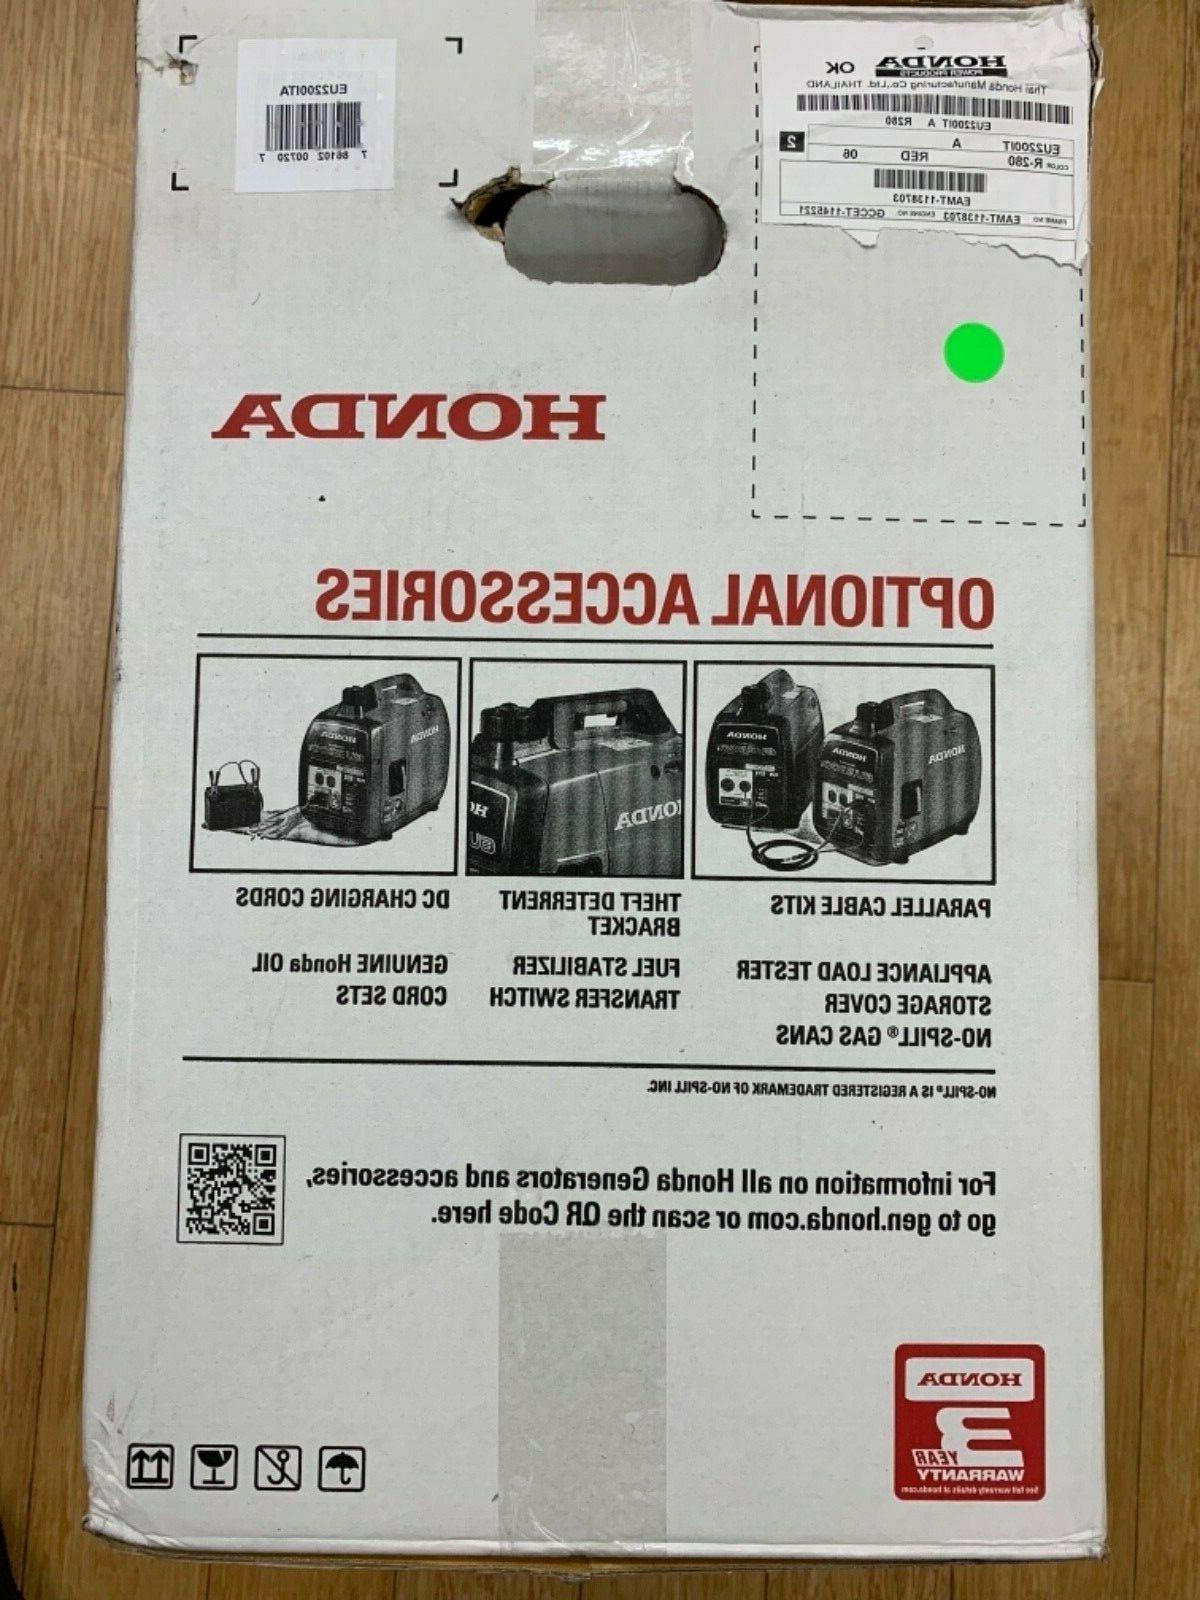 HONDA super 2200 generator inverter